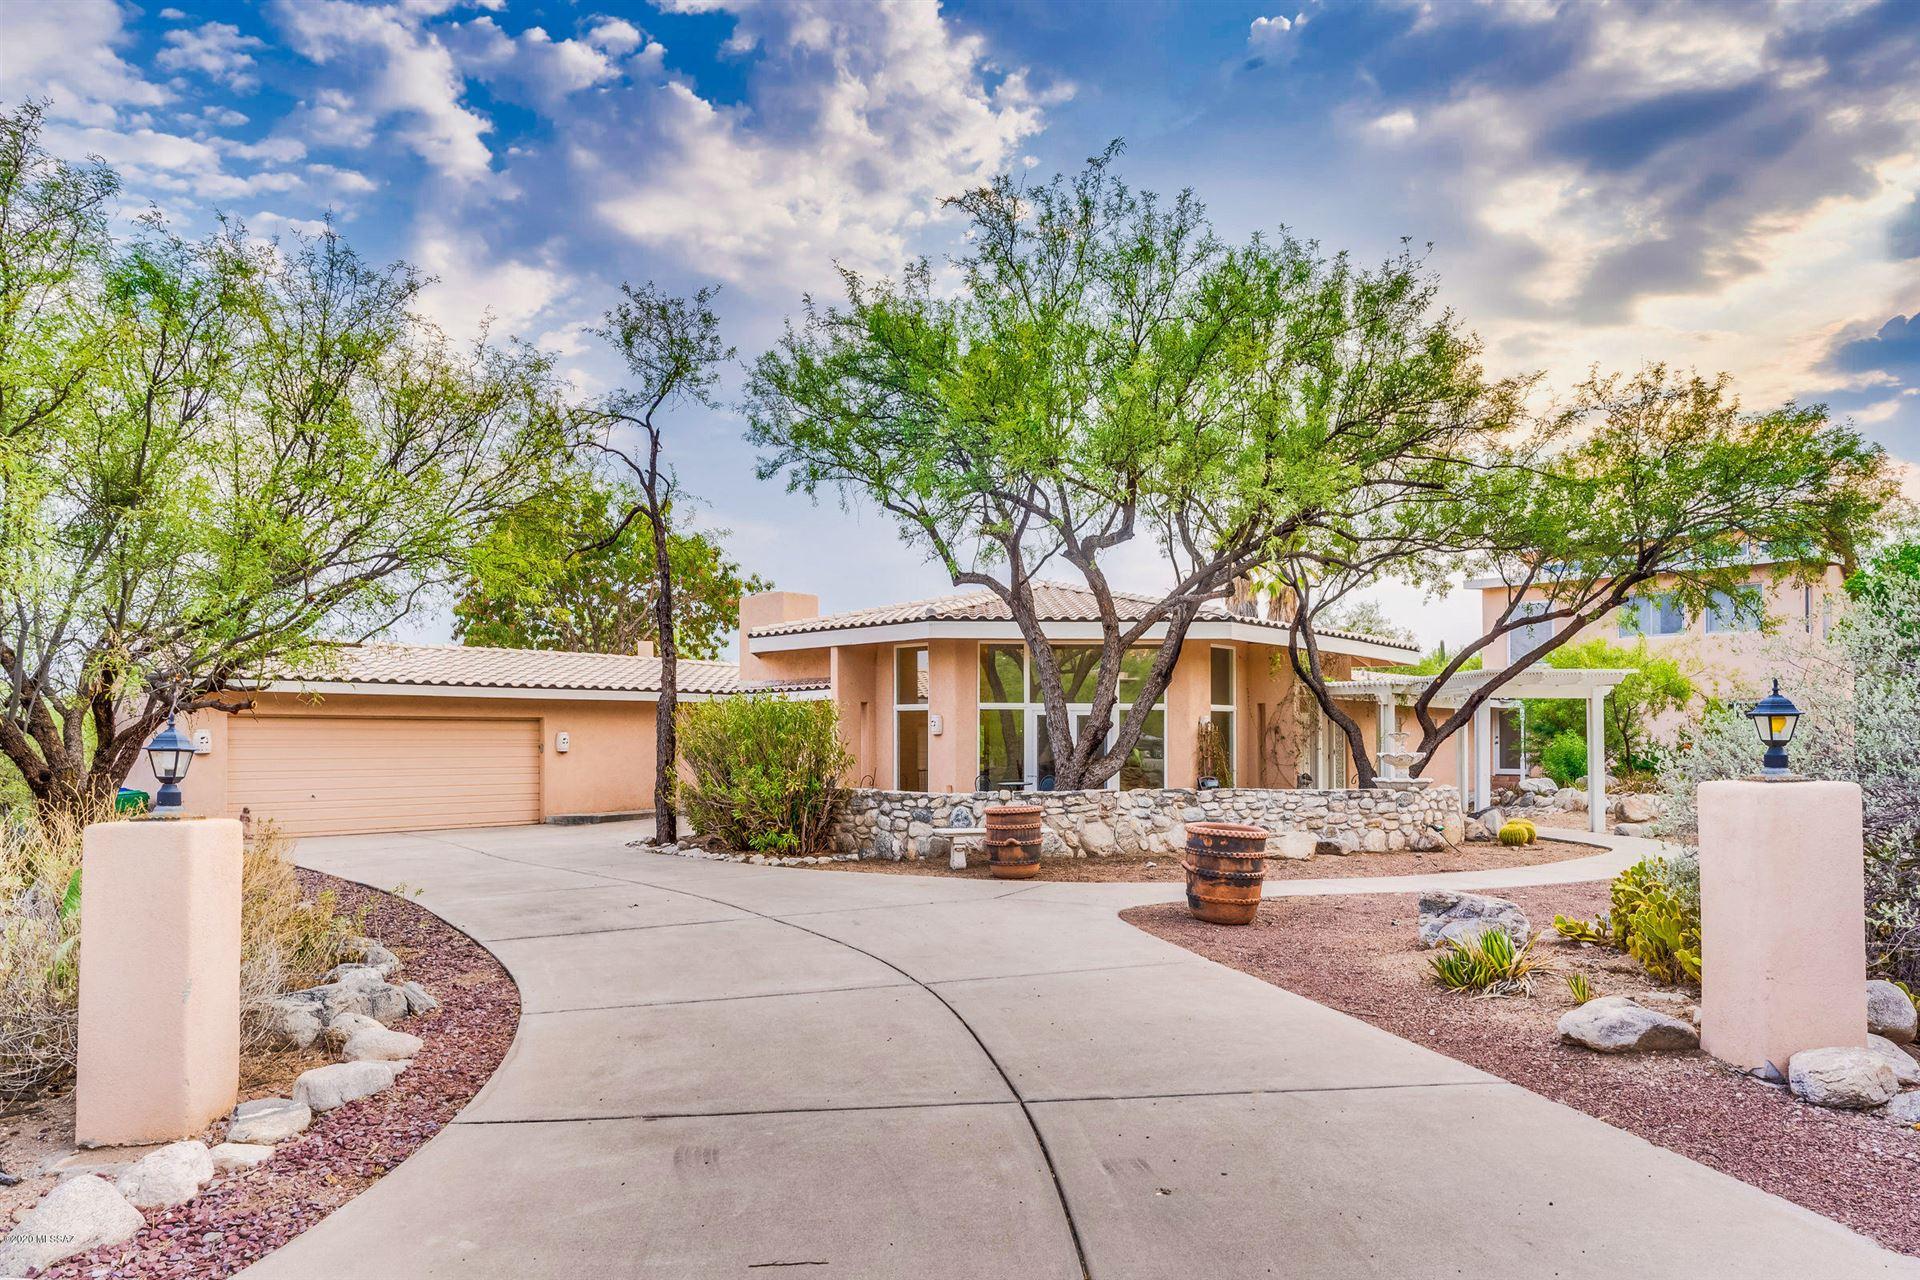 6641 N Placita Arquilla, Tucson, AZ 85718 - MLS#: 22021340